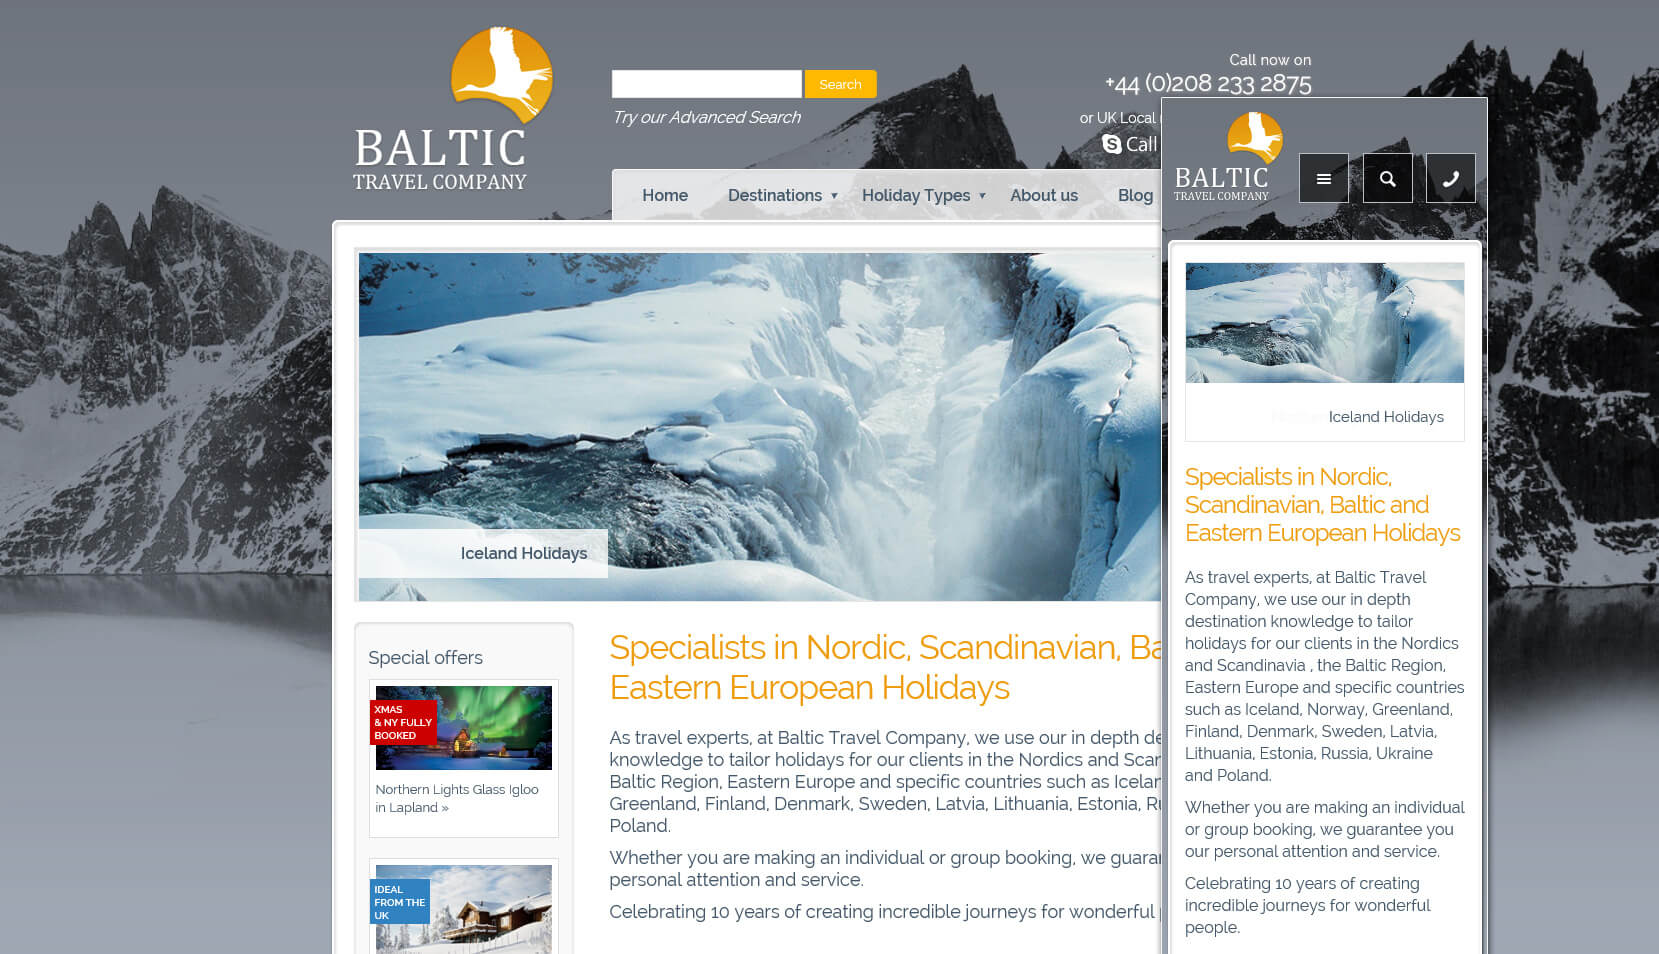 BalticTravel